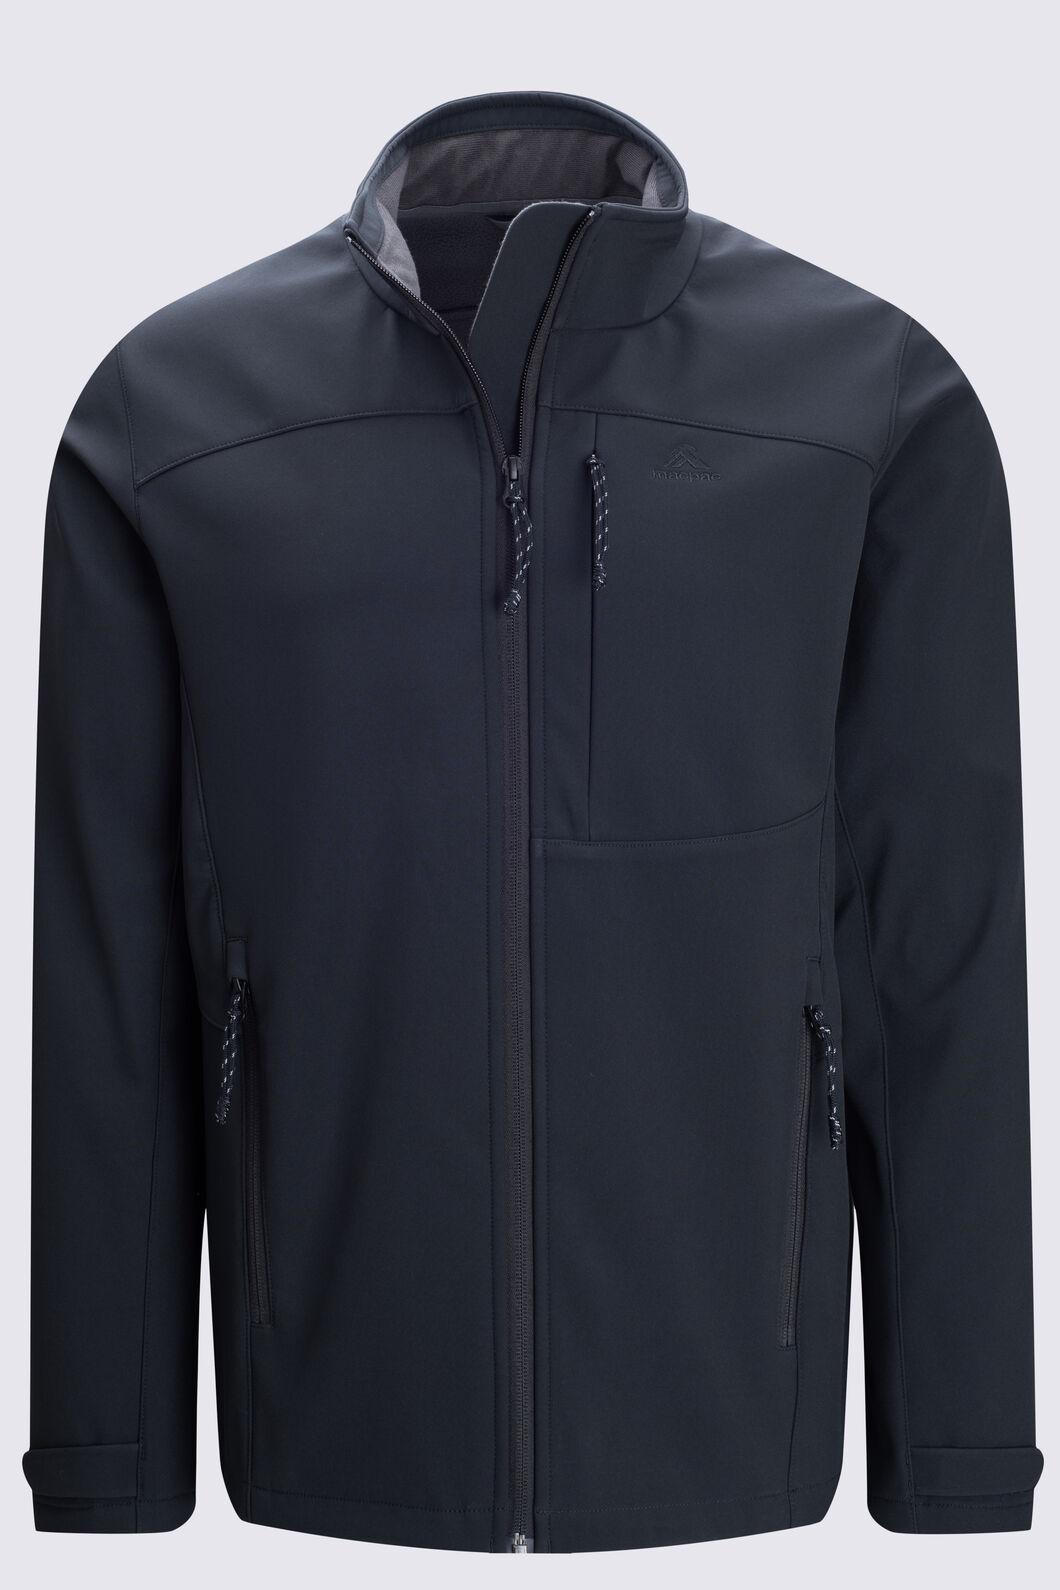 Macpac Men's Sabre Softshell Jacket, Black, hi-res